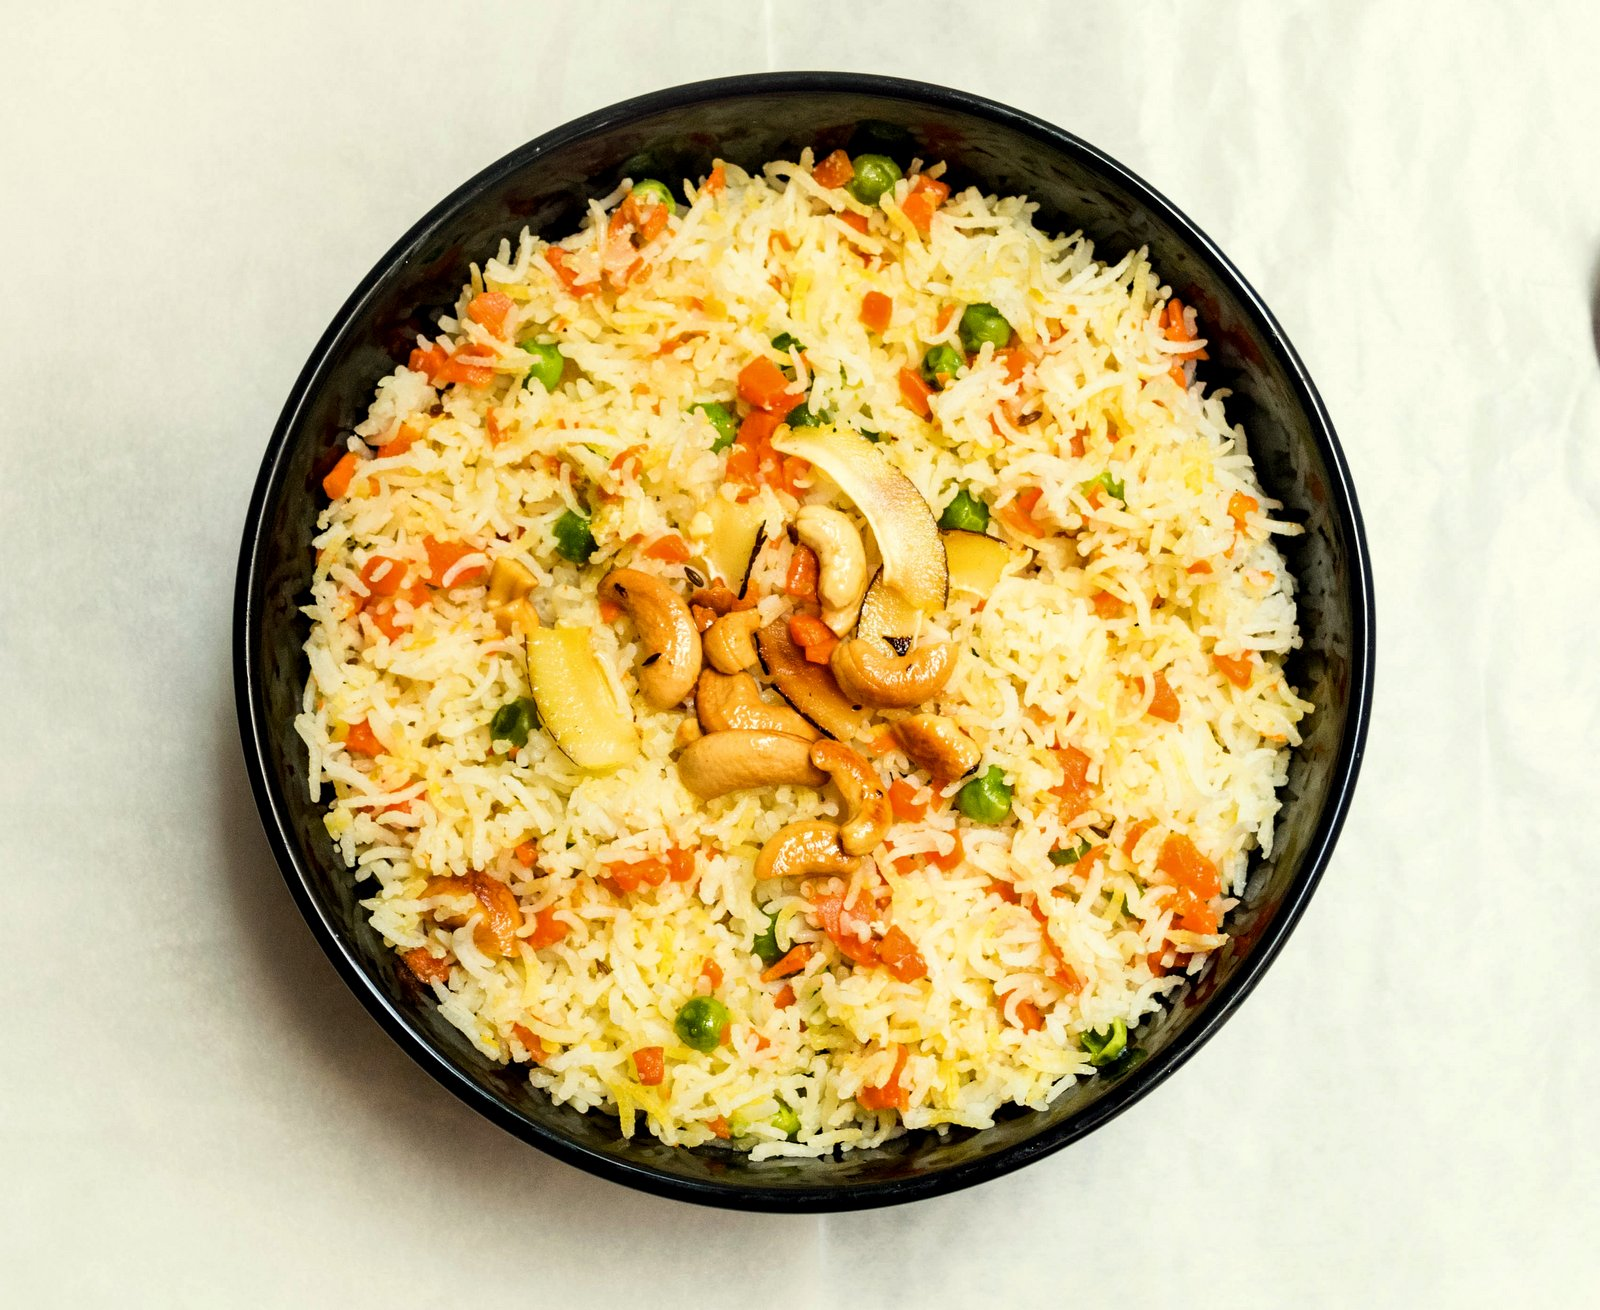 Coconut rice pulao with coconut cream recipe by archanas kitchen coconut rice pulao with coconut cream recipe ccuart Image collections